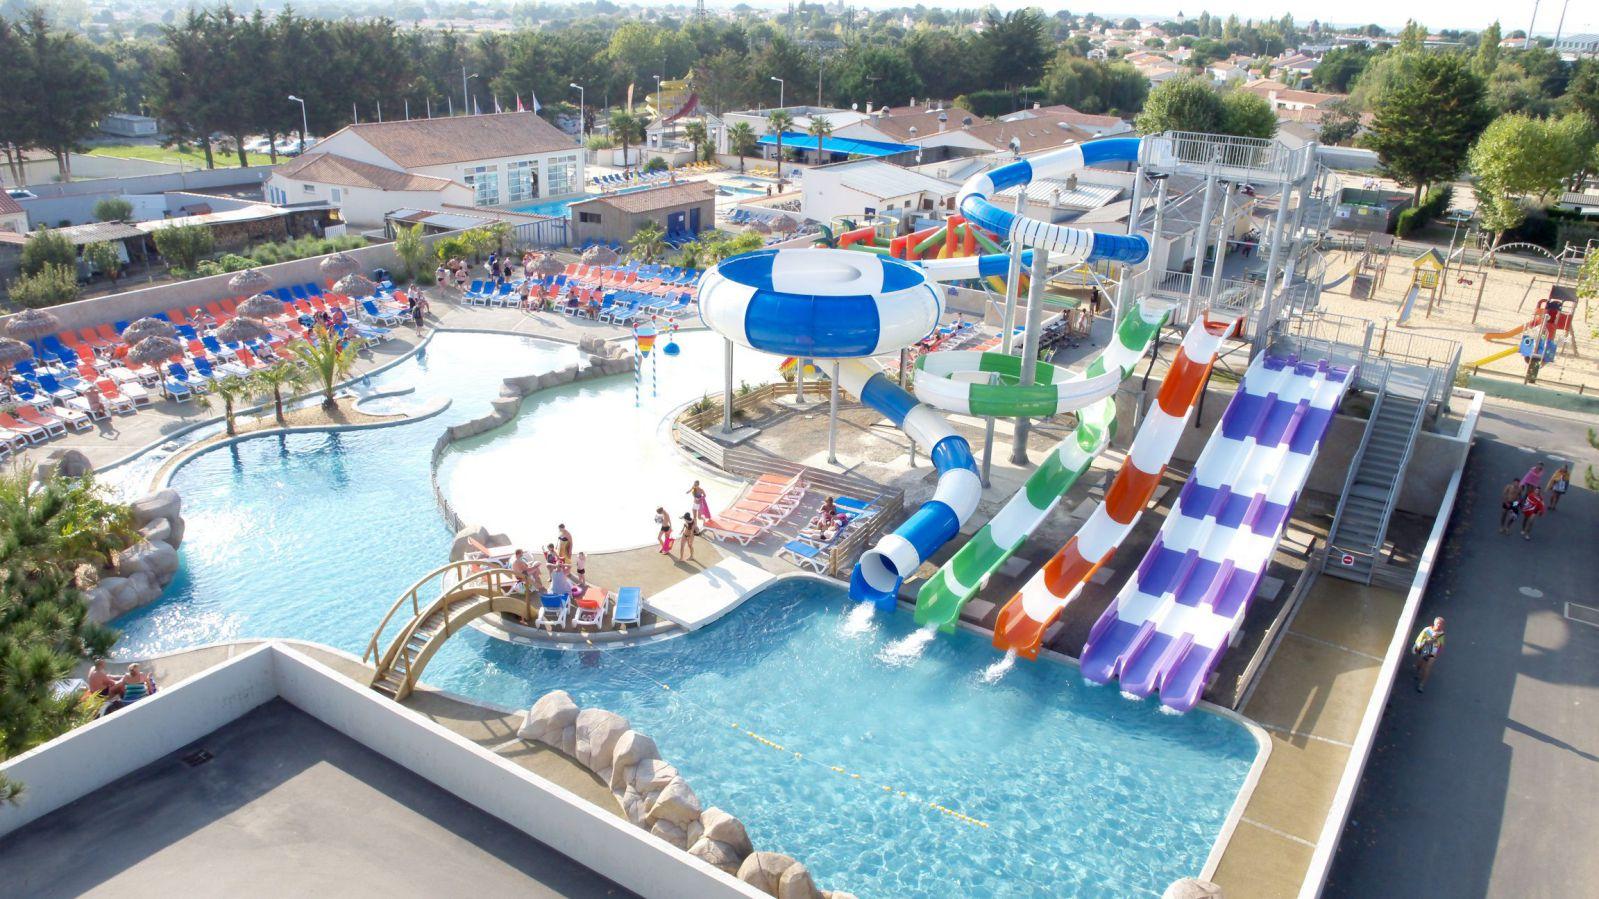 Sables d 39 olonne camping le trianon plein air vacances - Camping a valras plage avec piscine ...